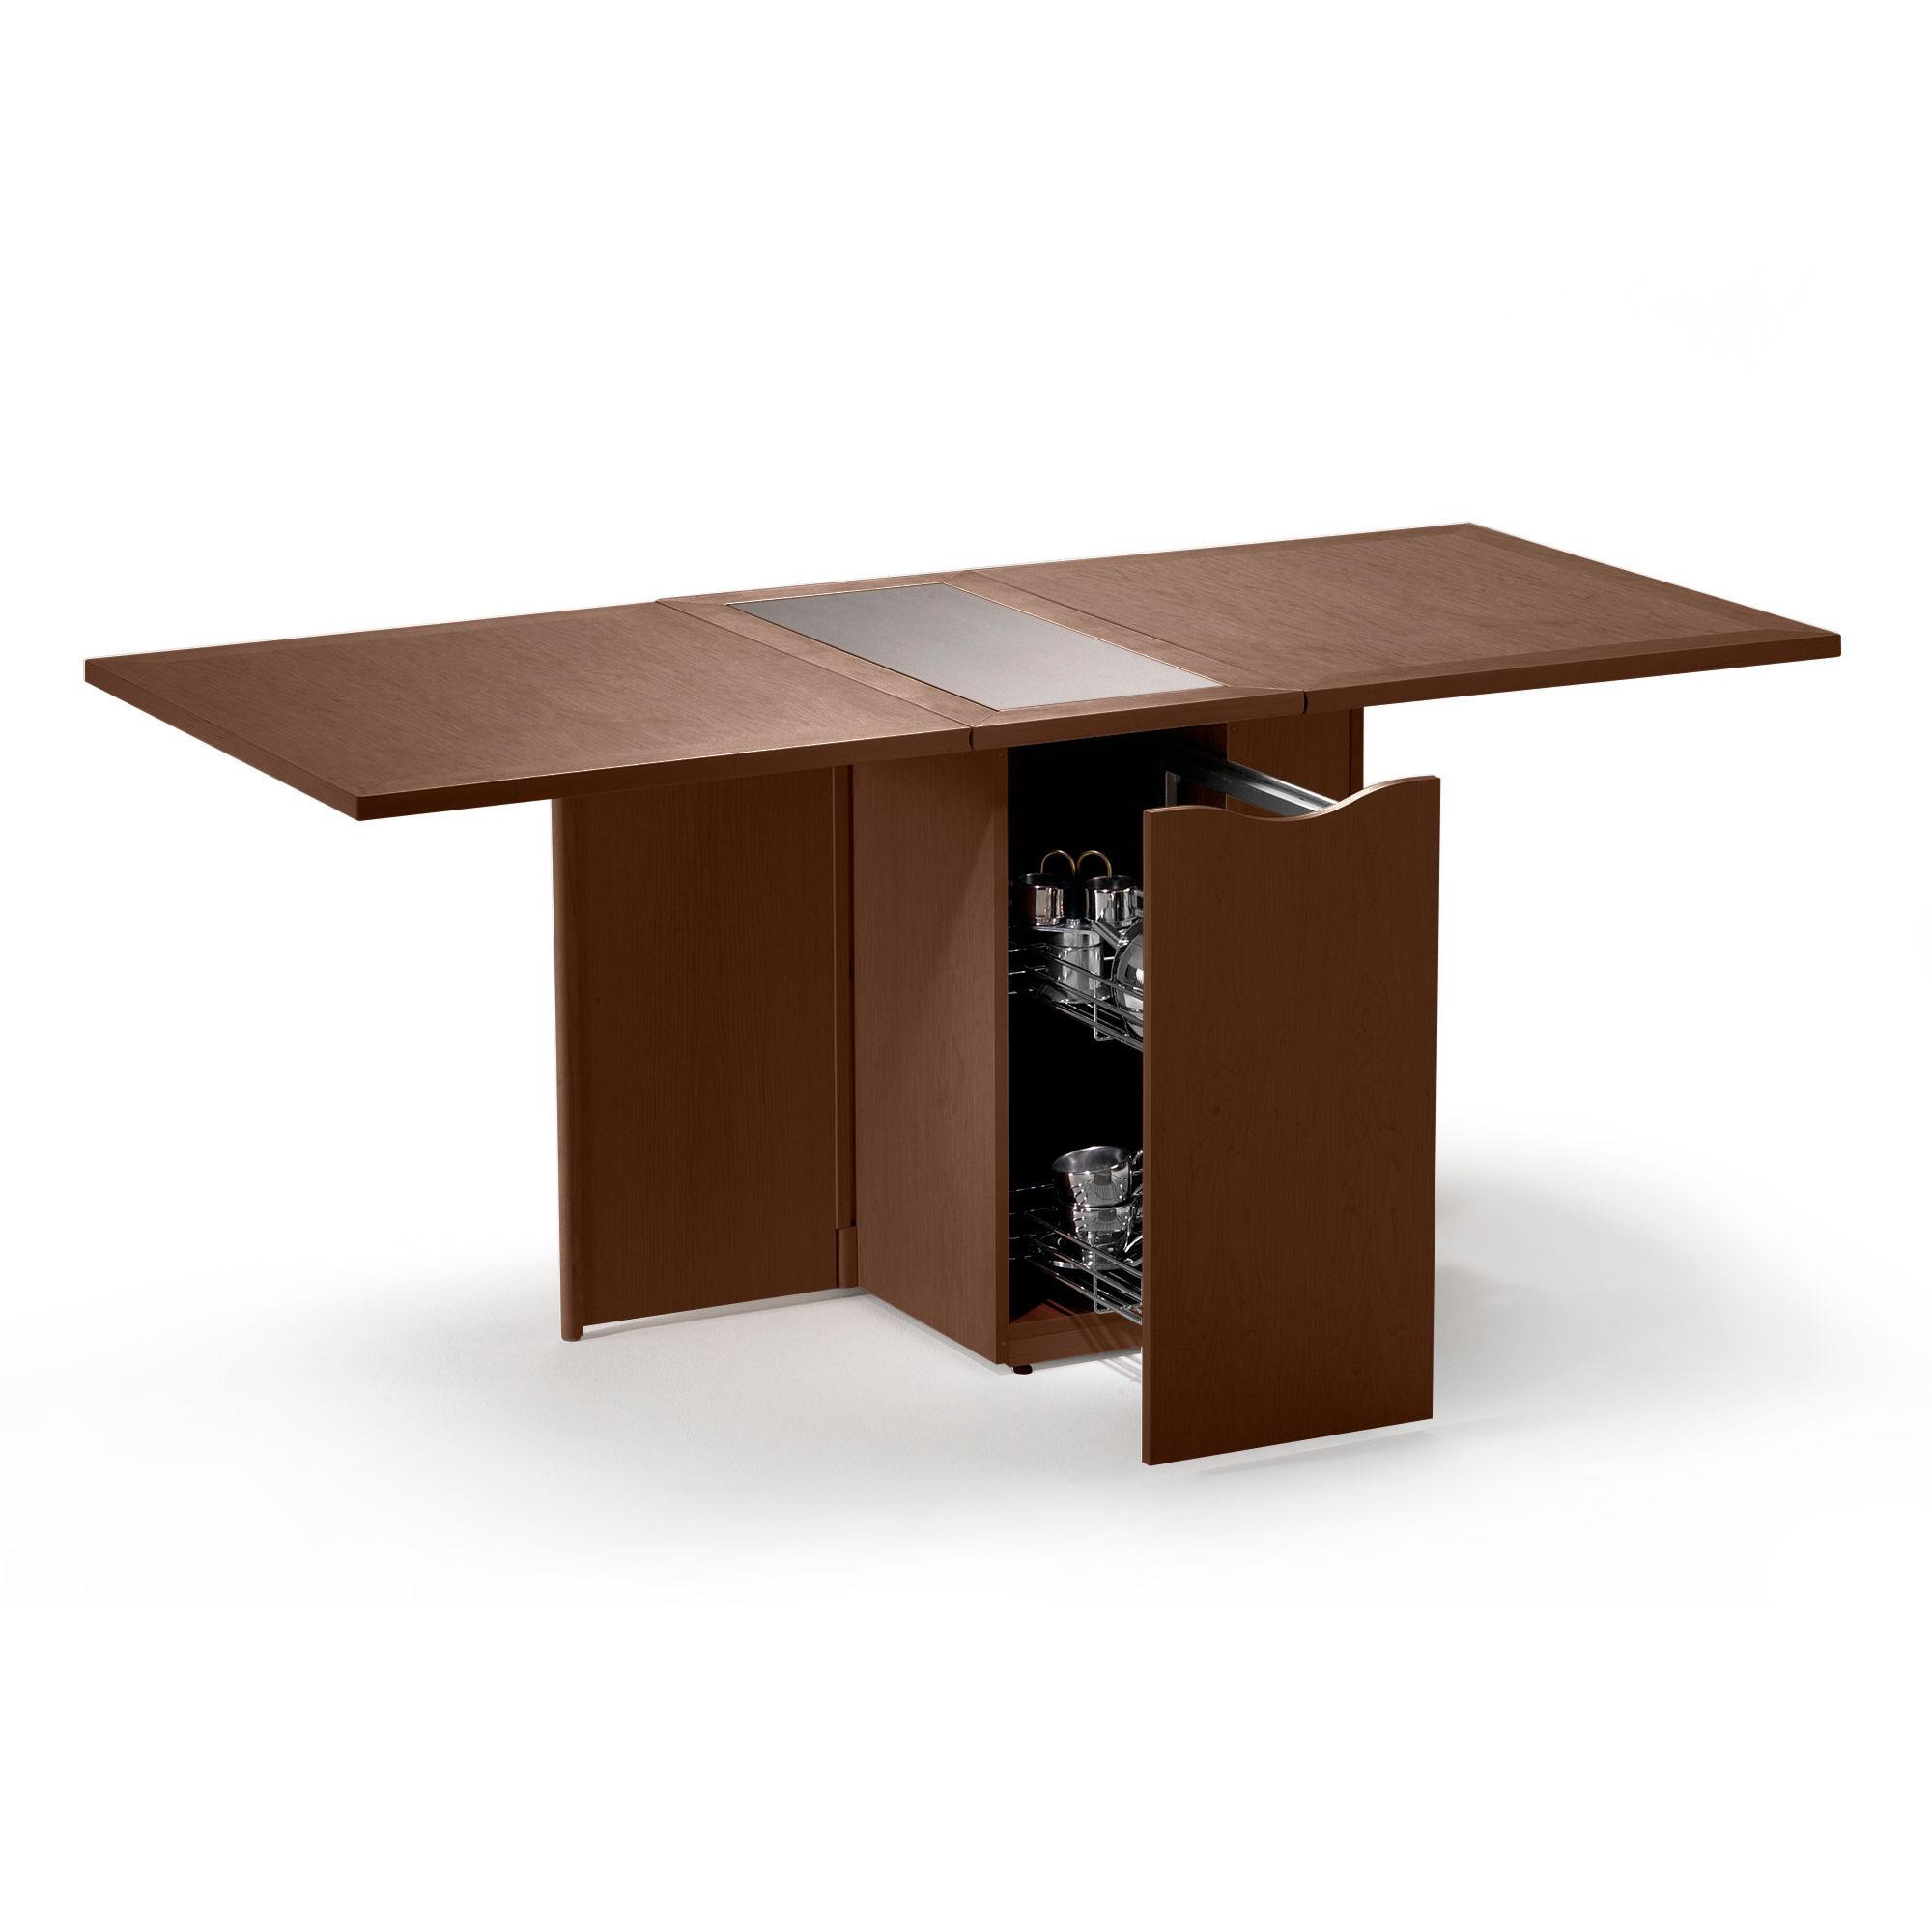 Skovby - Smart Furniture - Multi-Function Extending Table SM 101 by Skovby